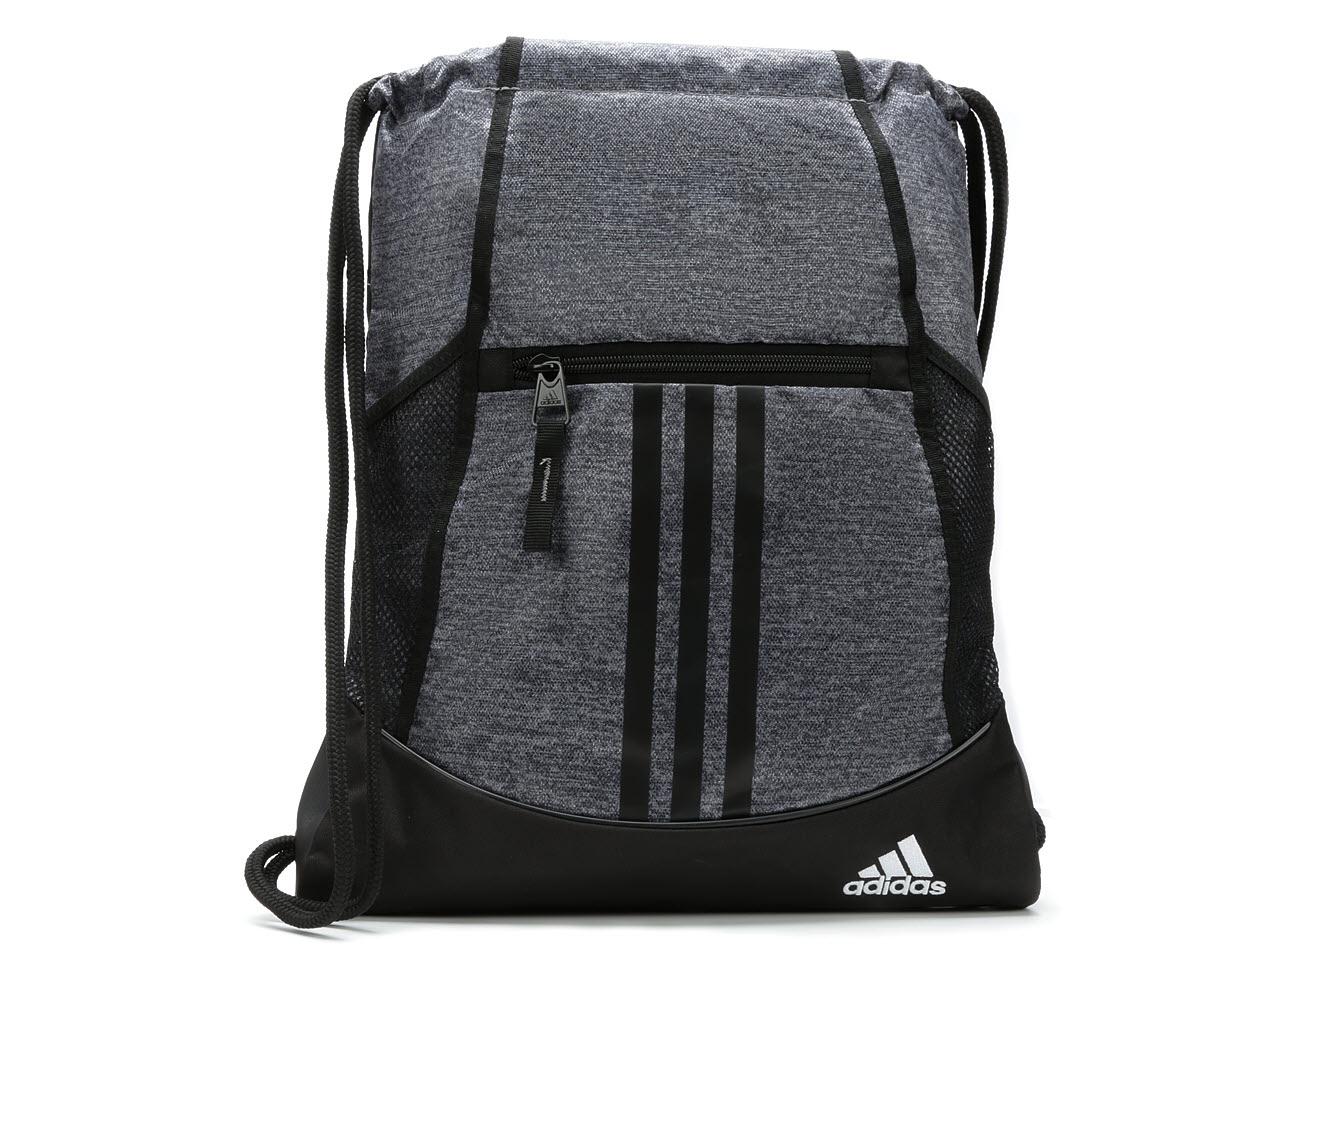 Adidas Alliance II Sackpack Drawstring Bag in Onix Jrsy/Black ...